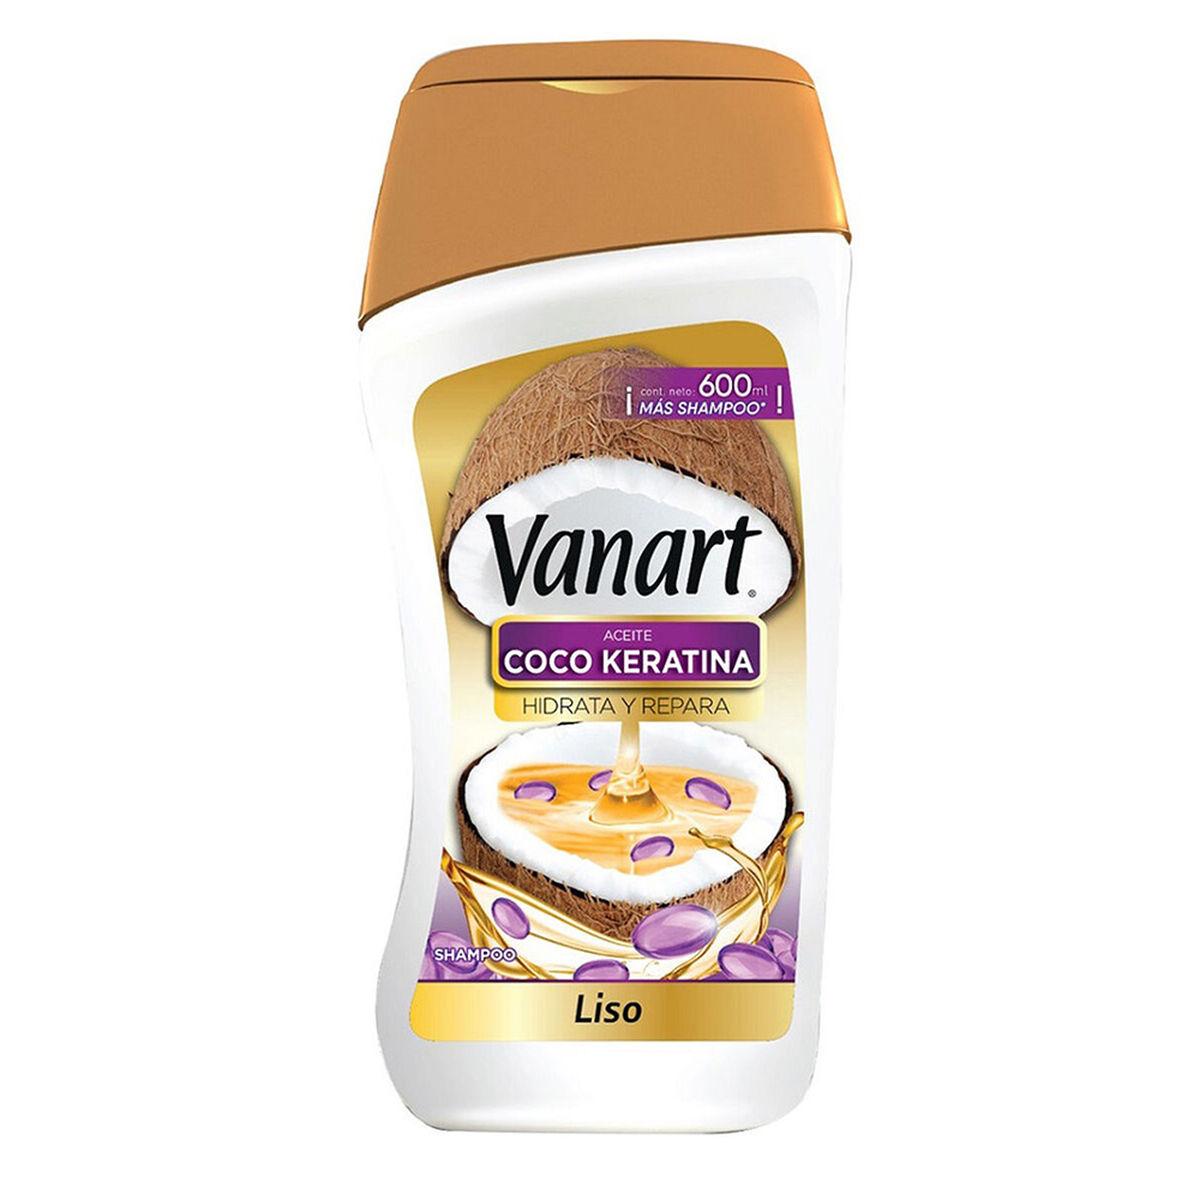 Pack Vanart Liso 2 Shampoo + 1 Acondicionador